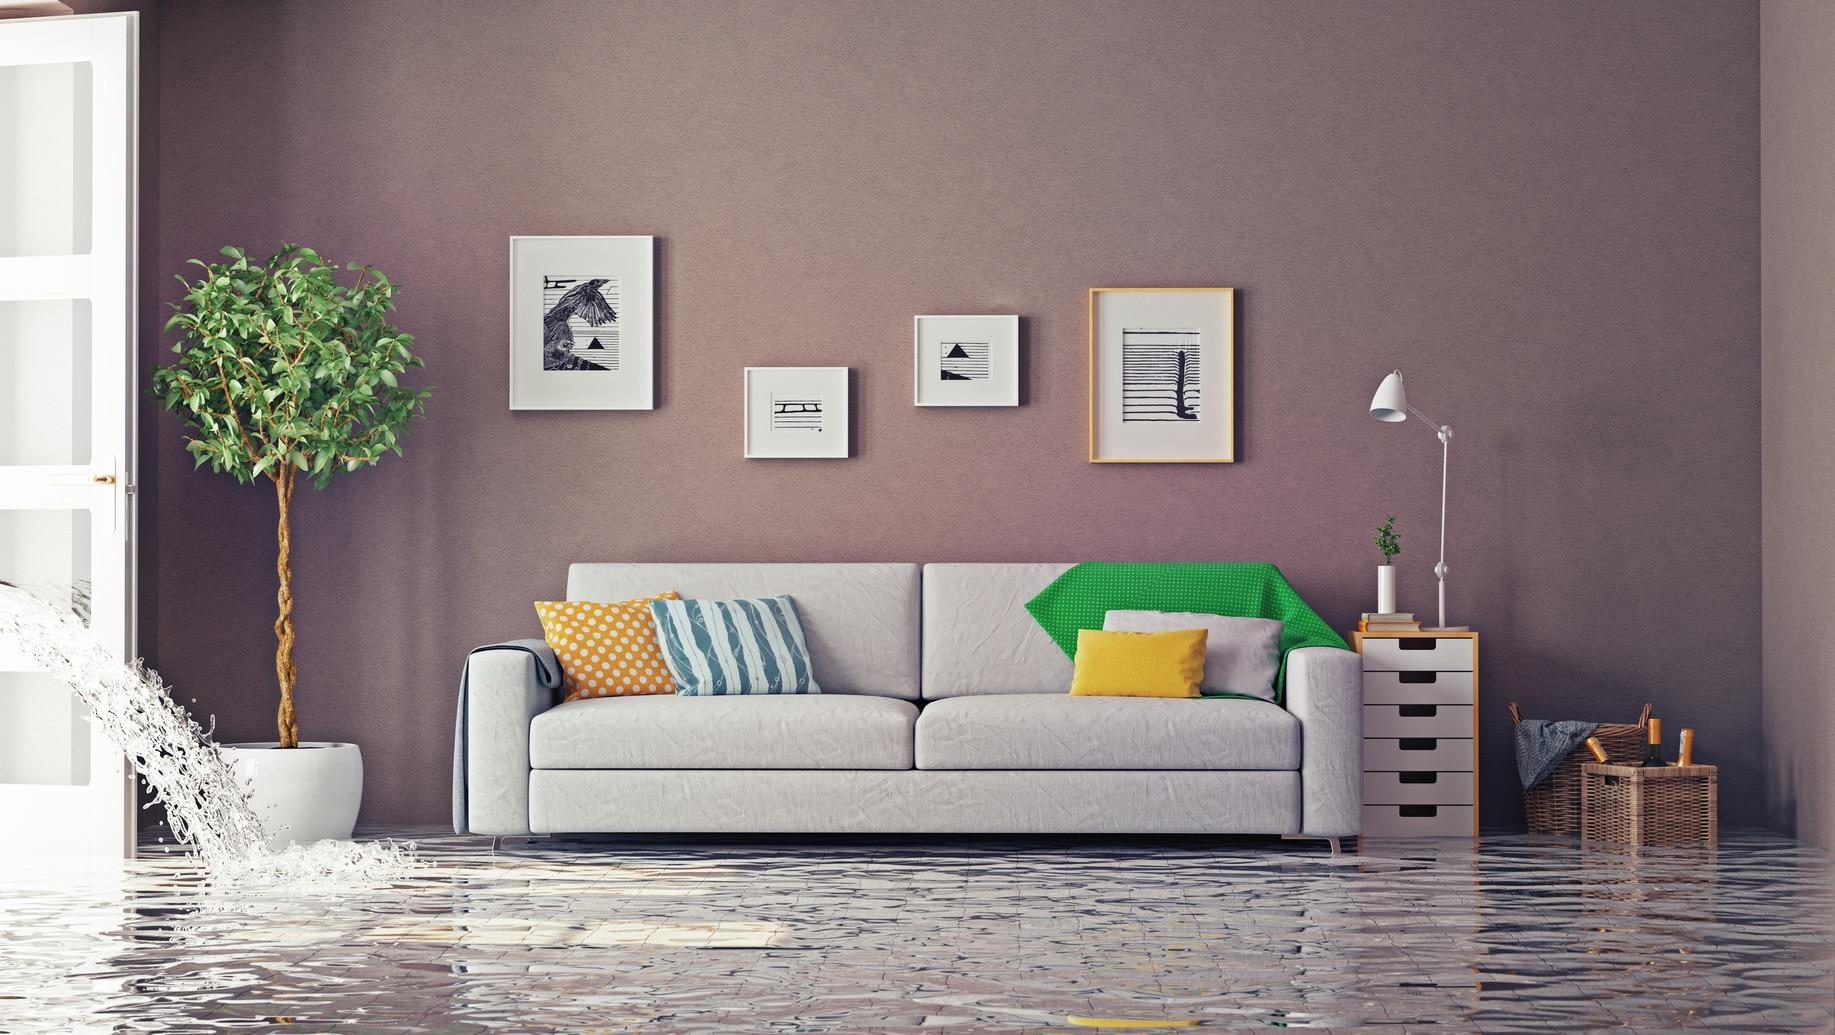 comment r aliser une d claration de sinistre. Black Bedroom Furniture Sets. Home Design Ideas